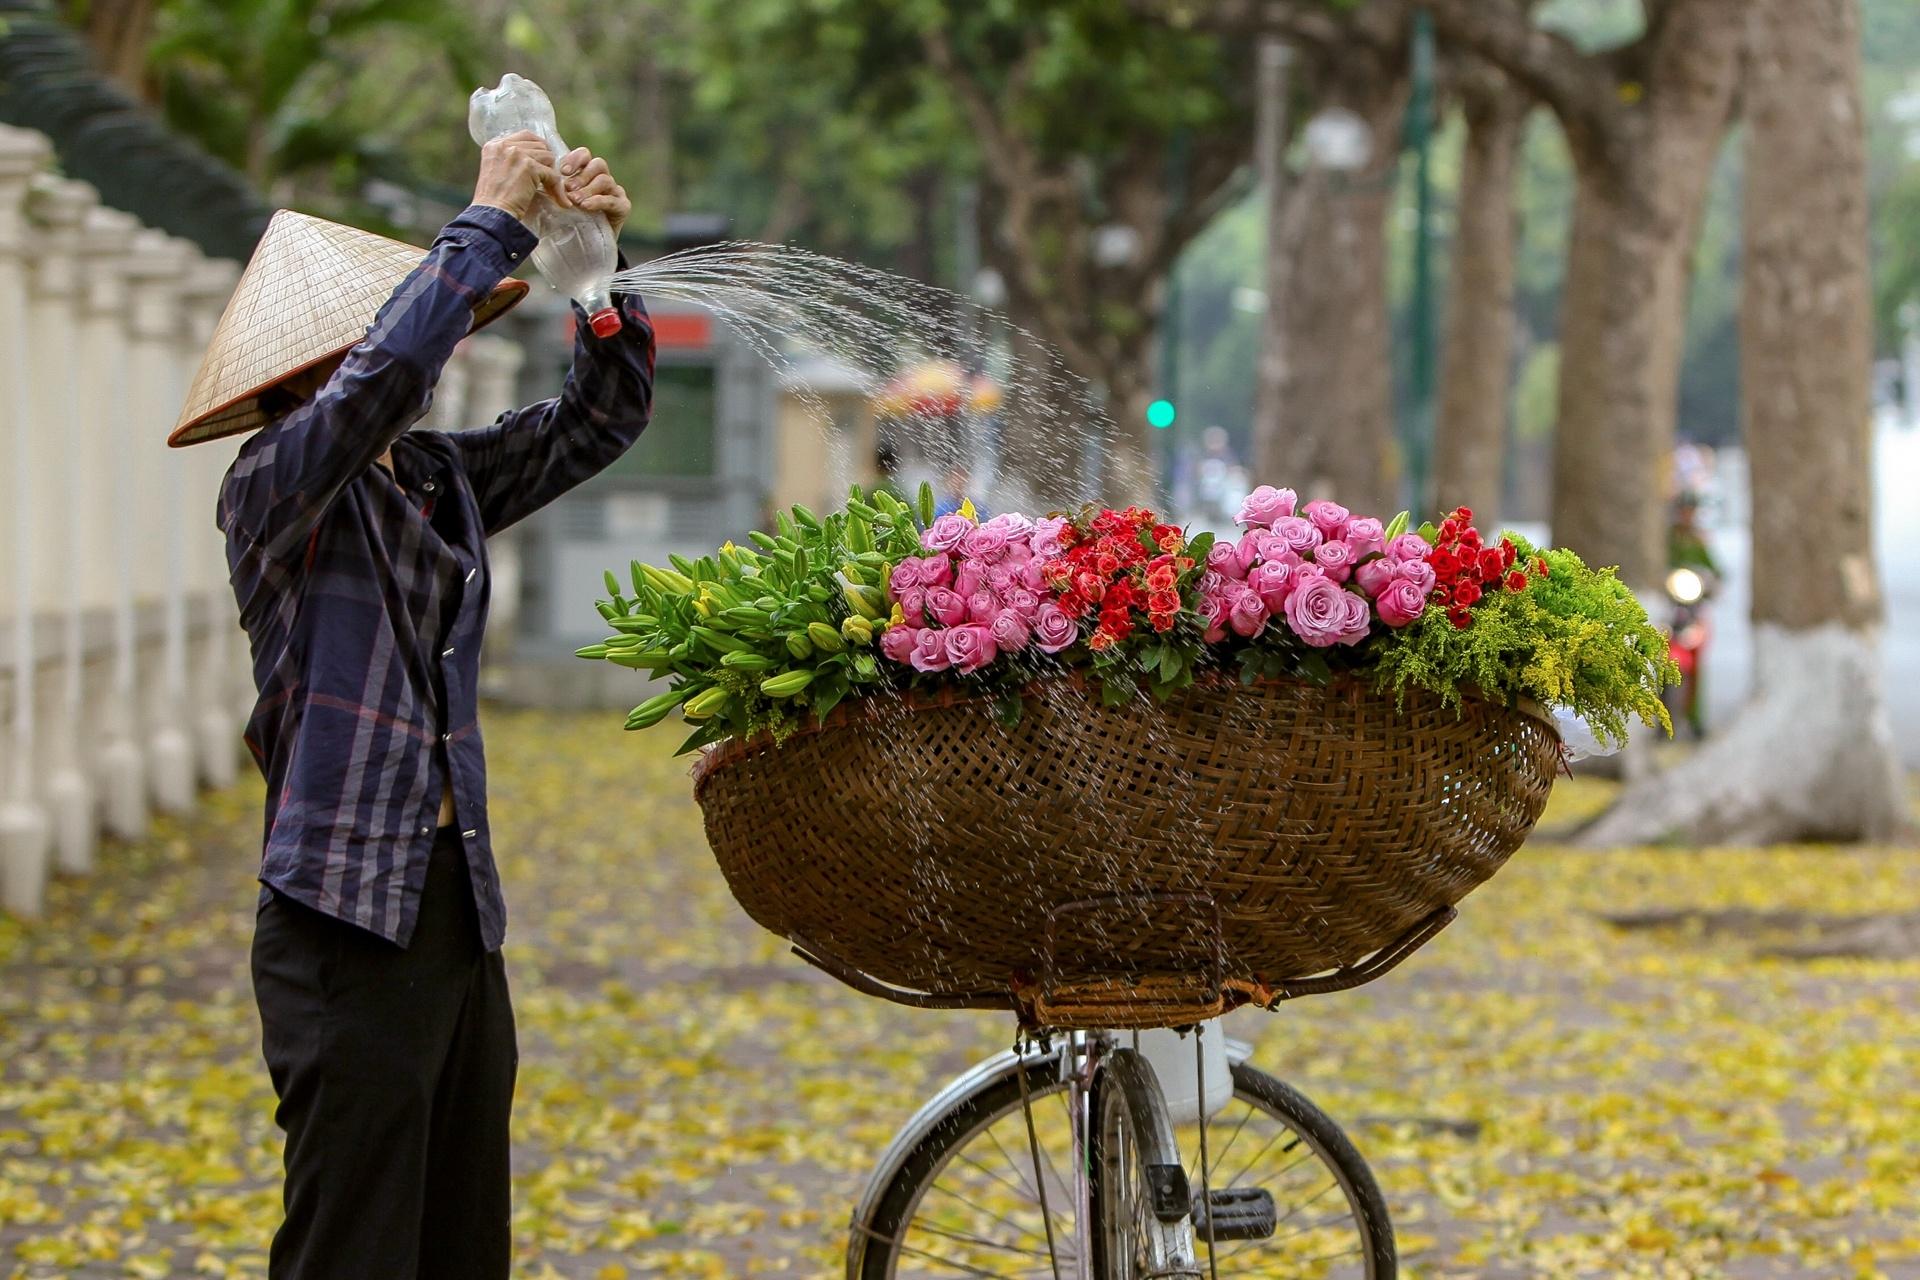 graceful hanoi in autumn days